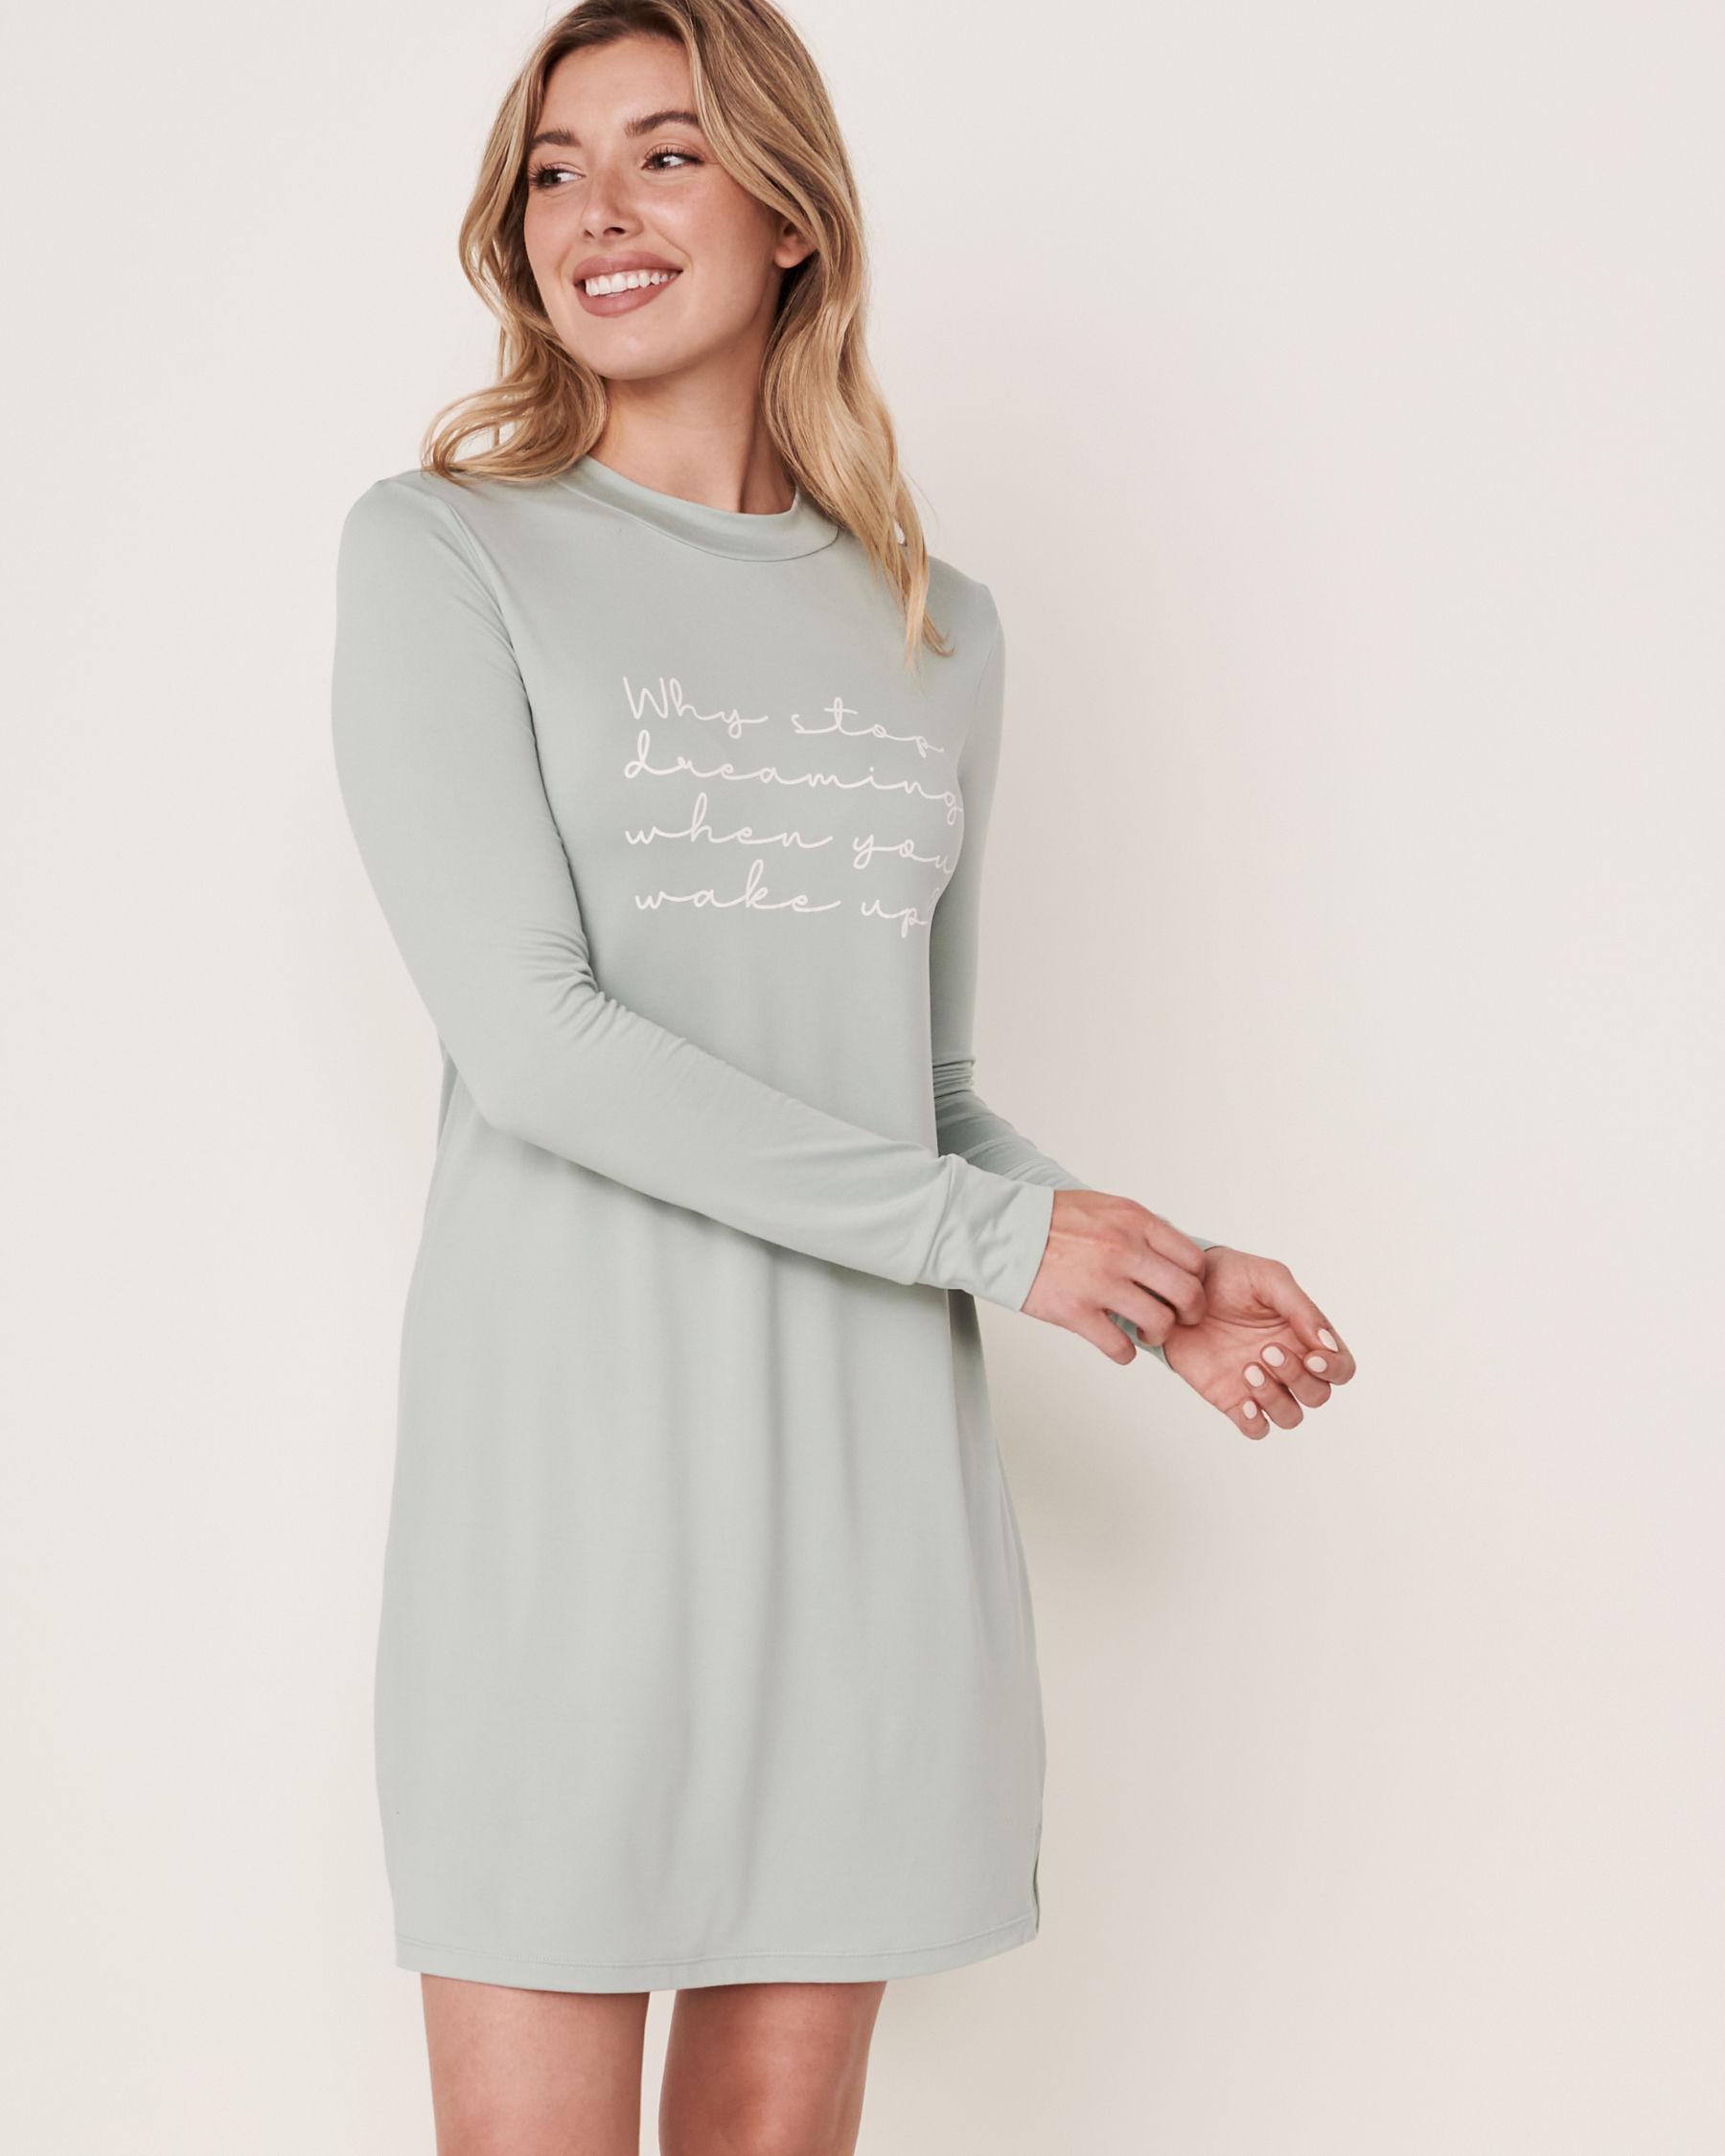 LA VIE EN ROSE High Neck Long Sleeve Sleepshirt Green 40500076 - View6